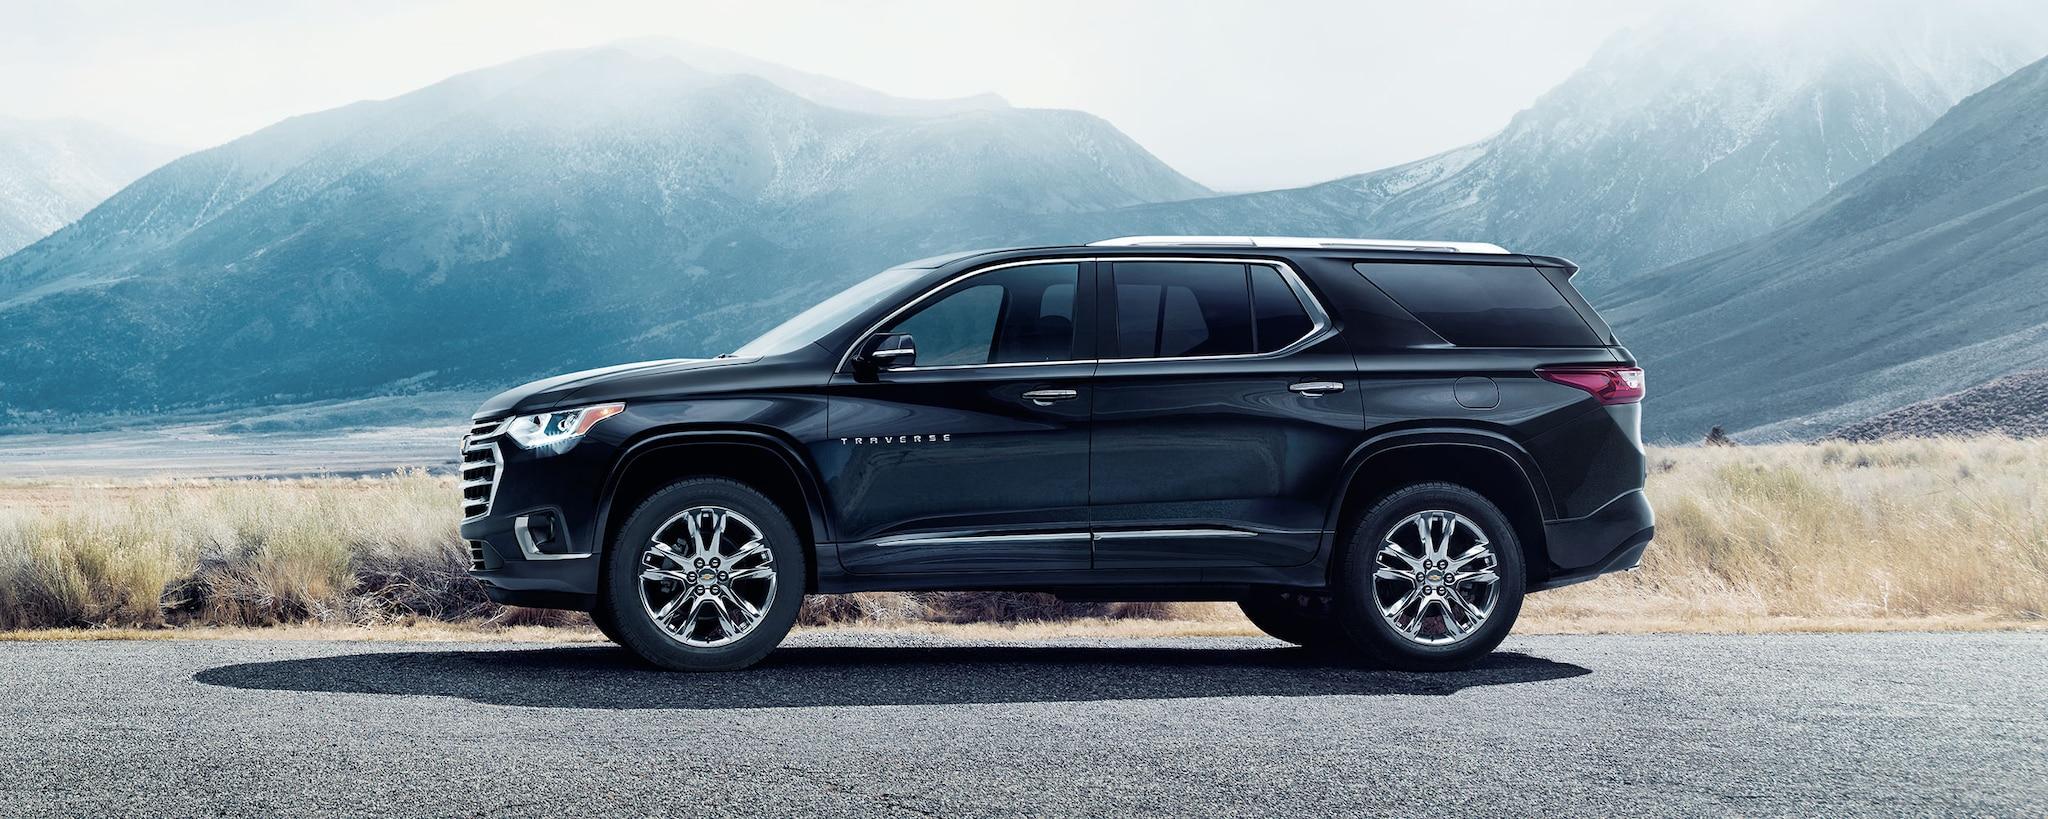 SUV Crossover de Chevrolet: Perfil lateral de la Traverse